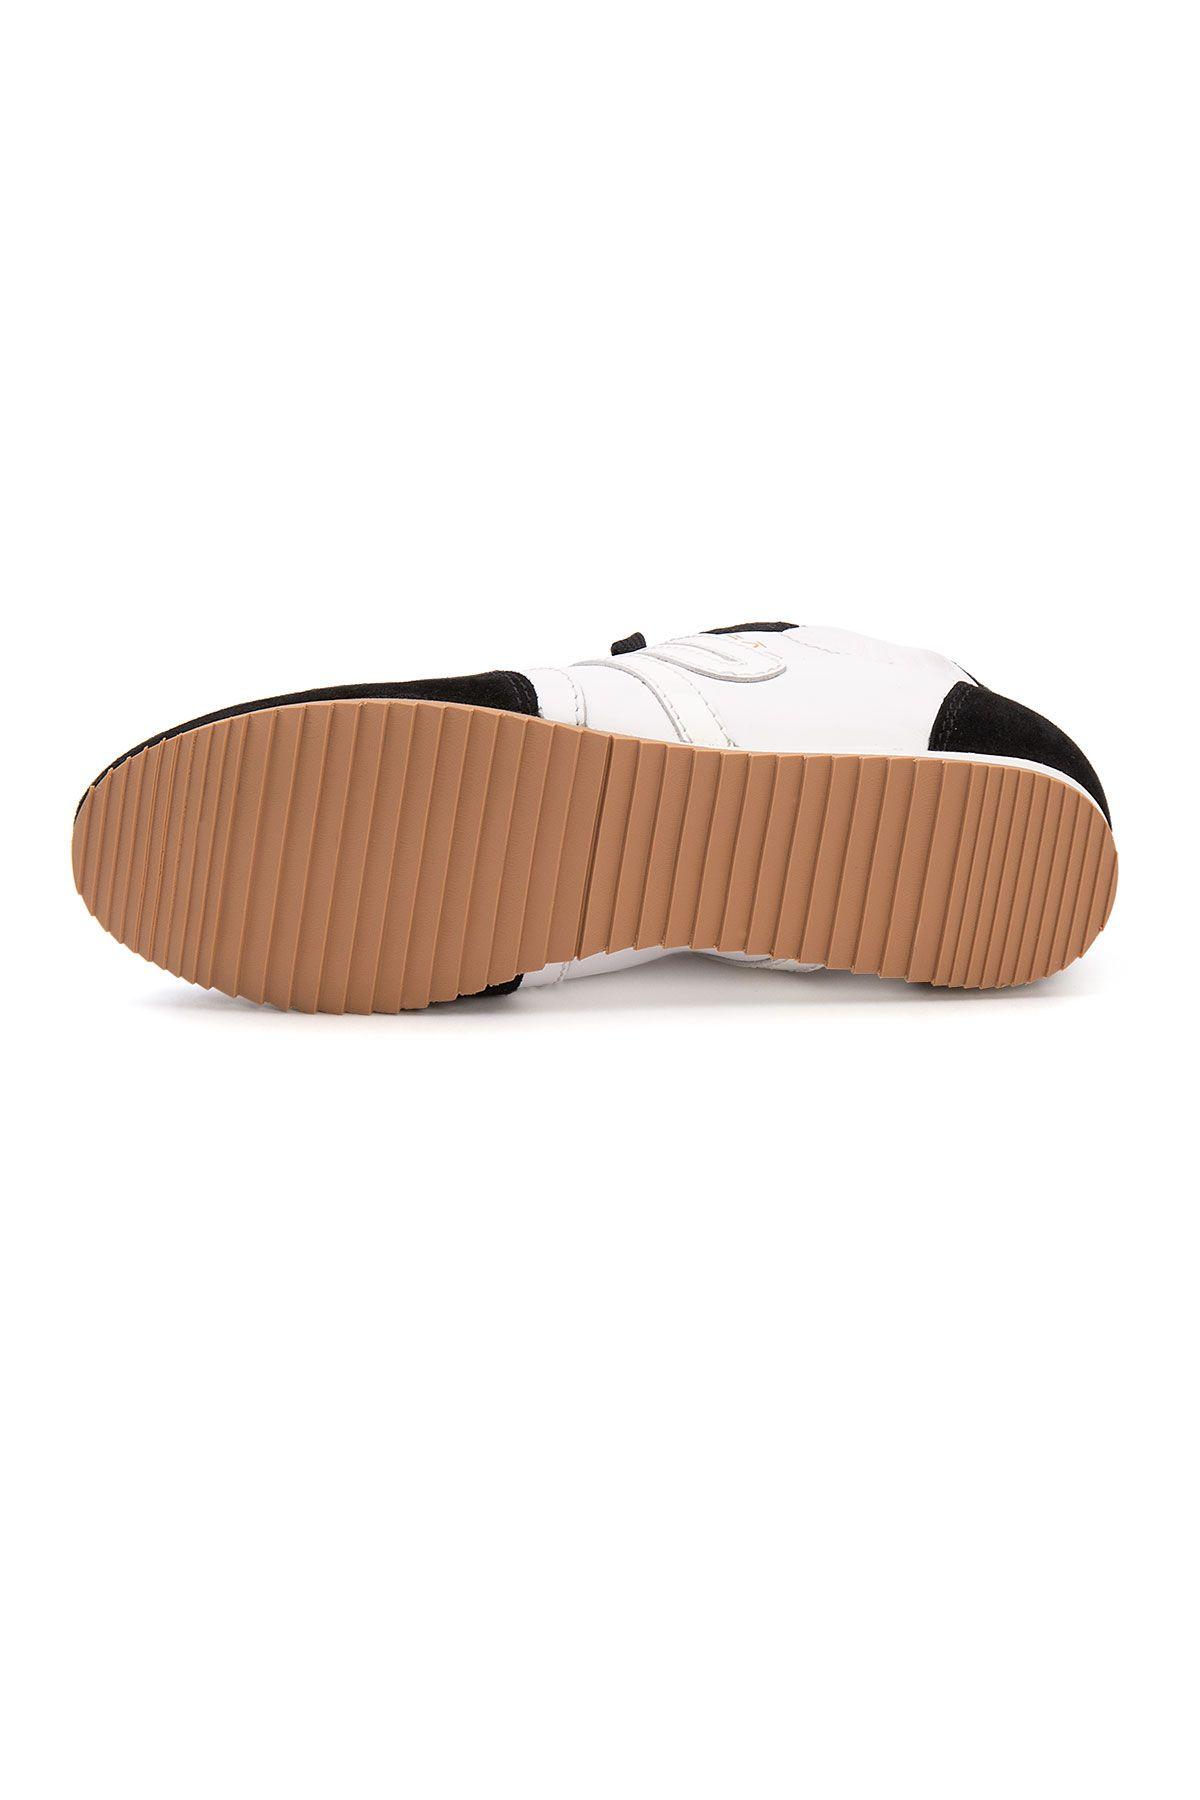 San Women's Leather Sneakers SAN05S Black